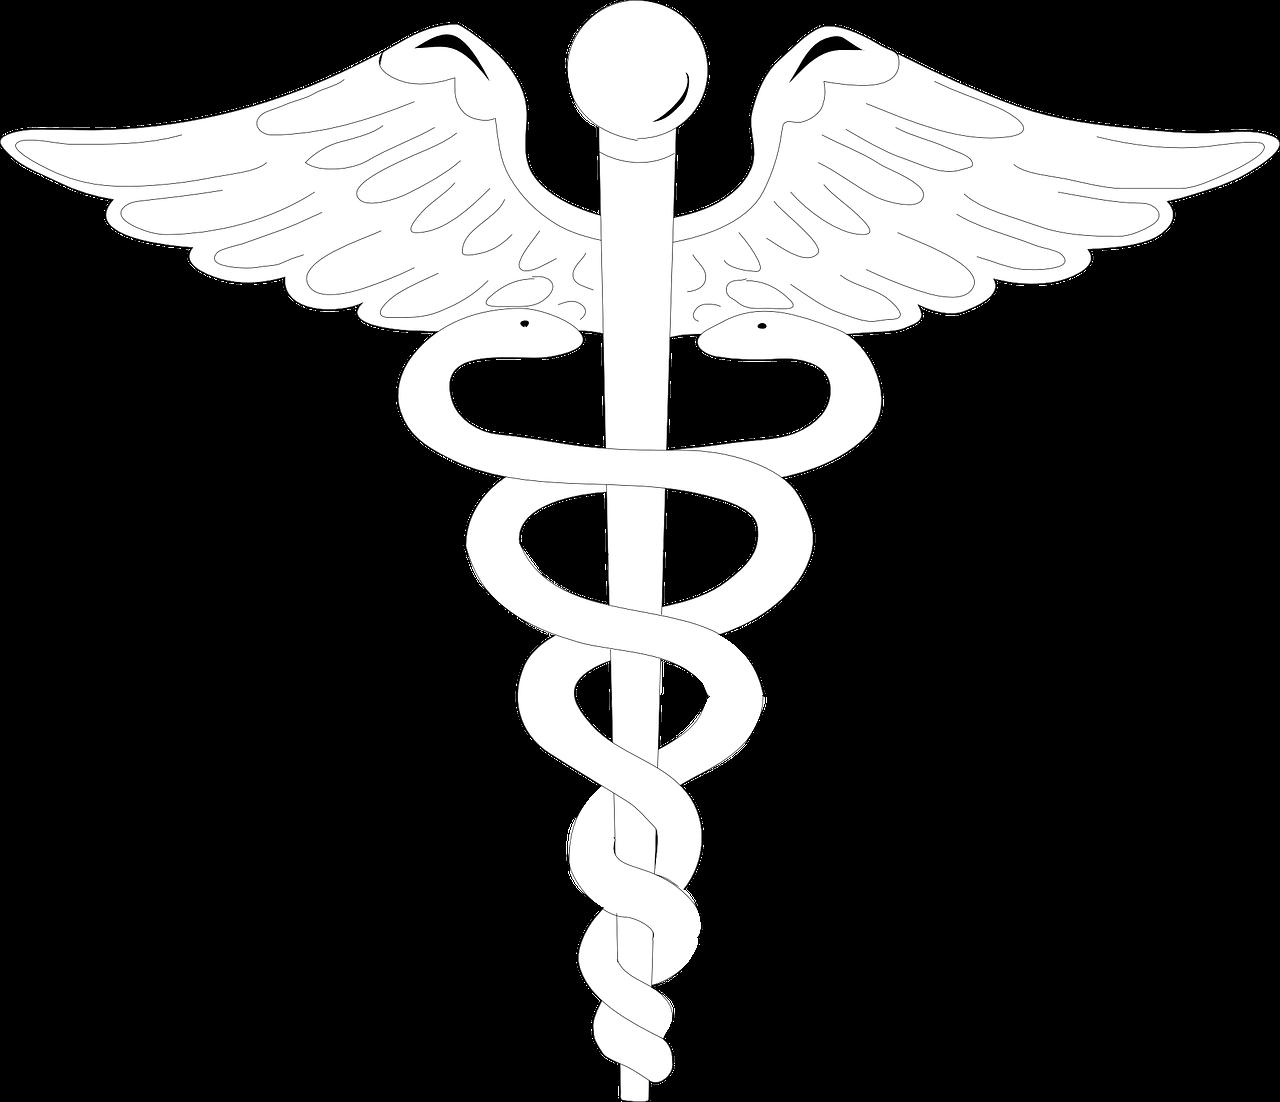 Logomedicalcaduceussignssymbols Free Photo From Needpix